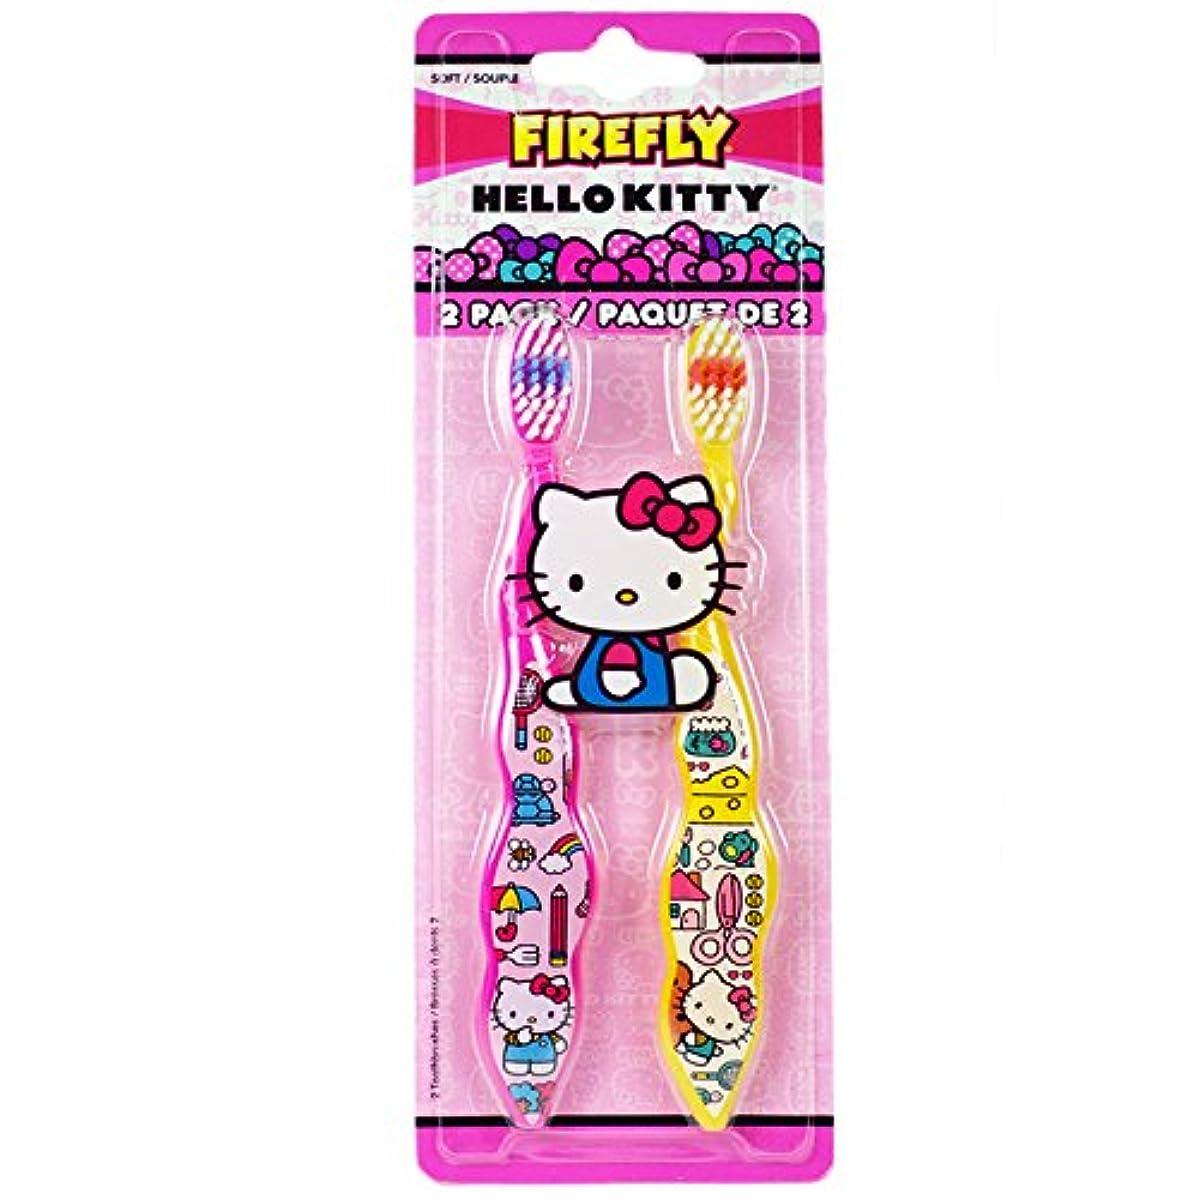 宣言発生器笑Dr. Fresh Firefly Hello Kitty Toothbrush, Soft by Firefly